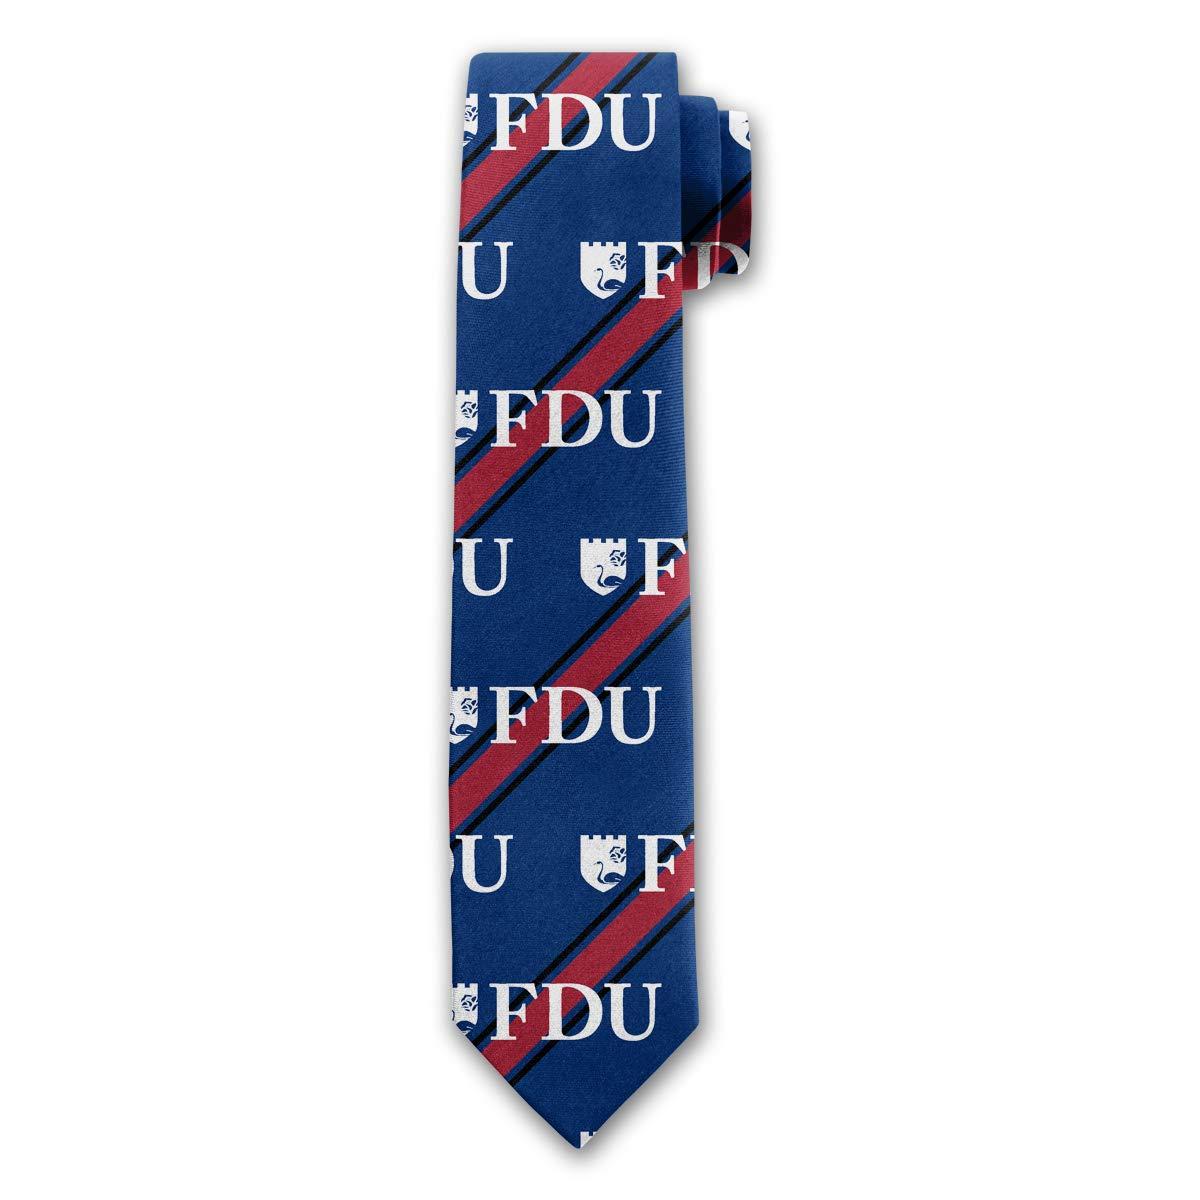 Venley NCAA Mens Official NCAA Fashion Novelty Necktie Ties